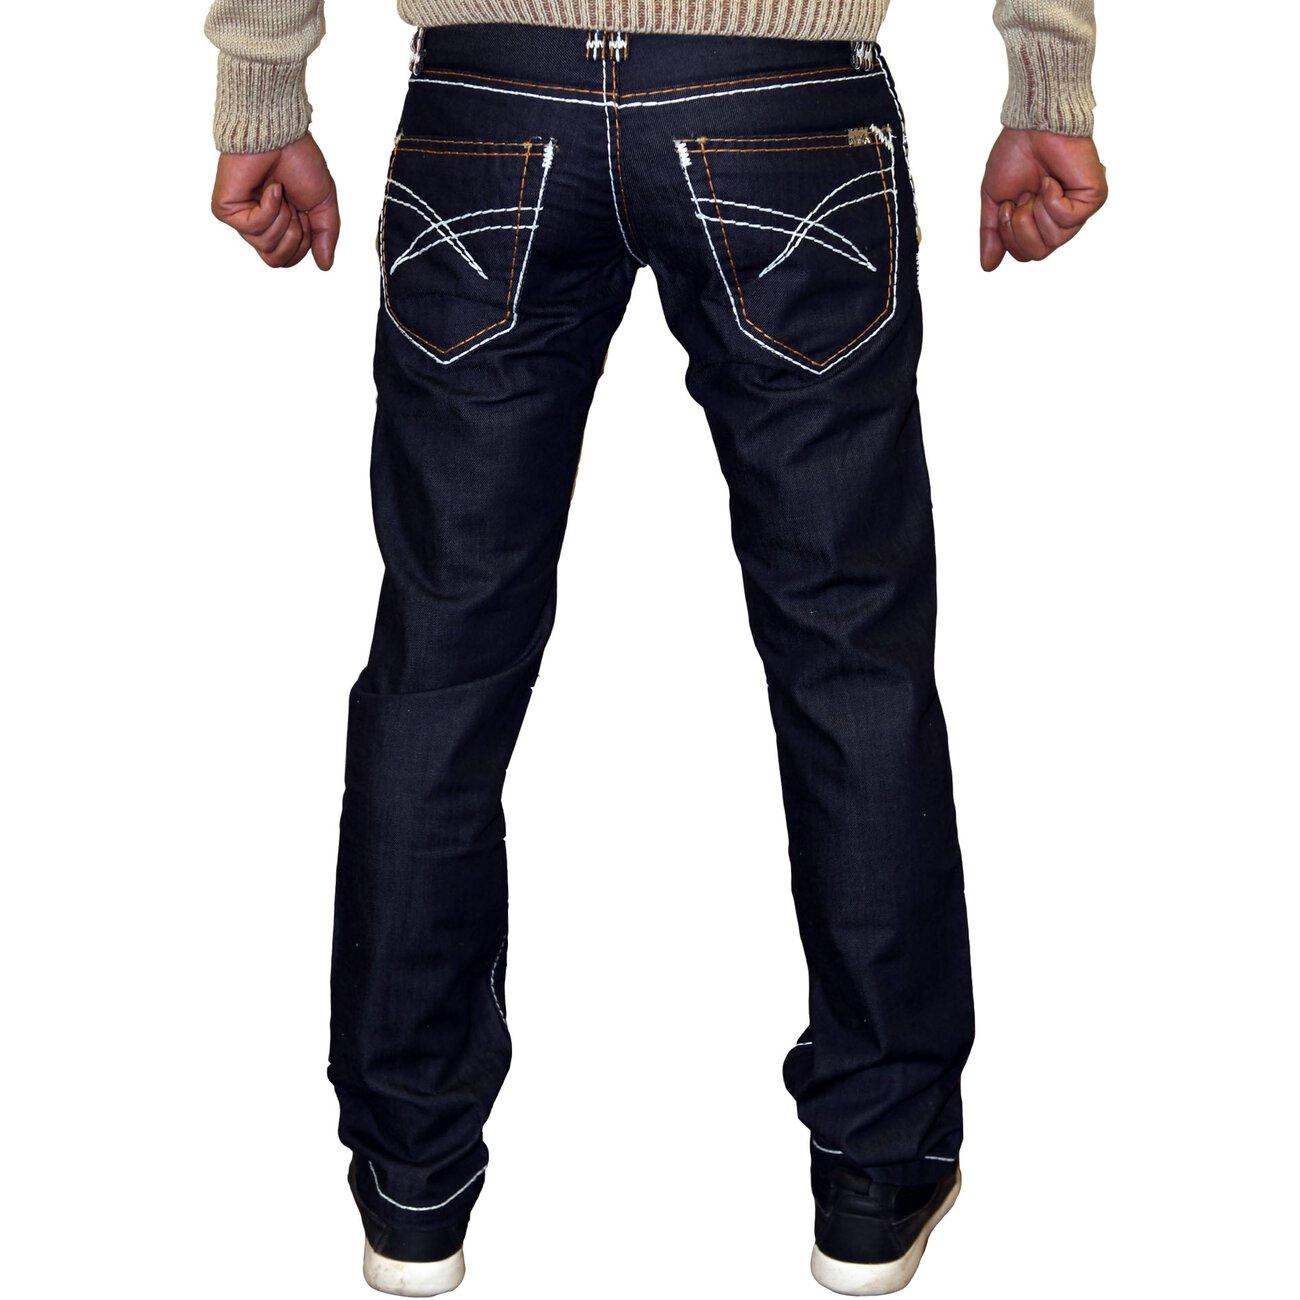 ReRock Jeanshose Herren Dicke Naht Männer Jeans RR-3041A